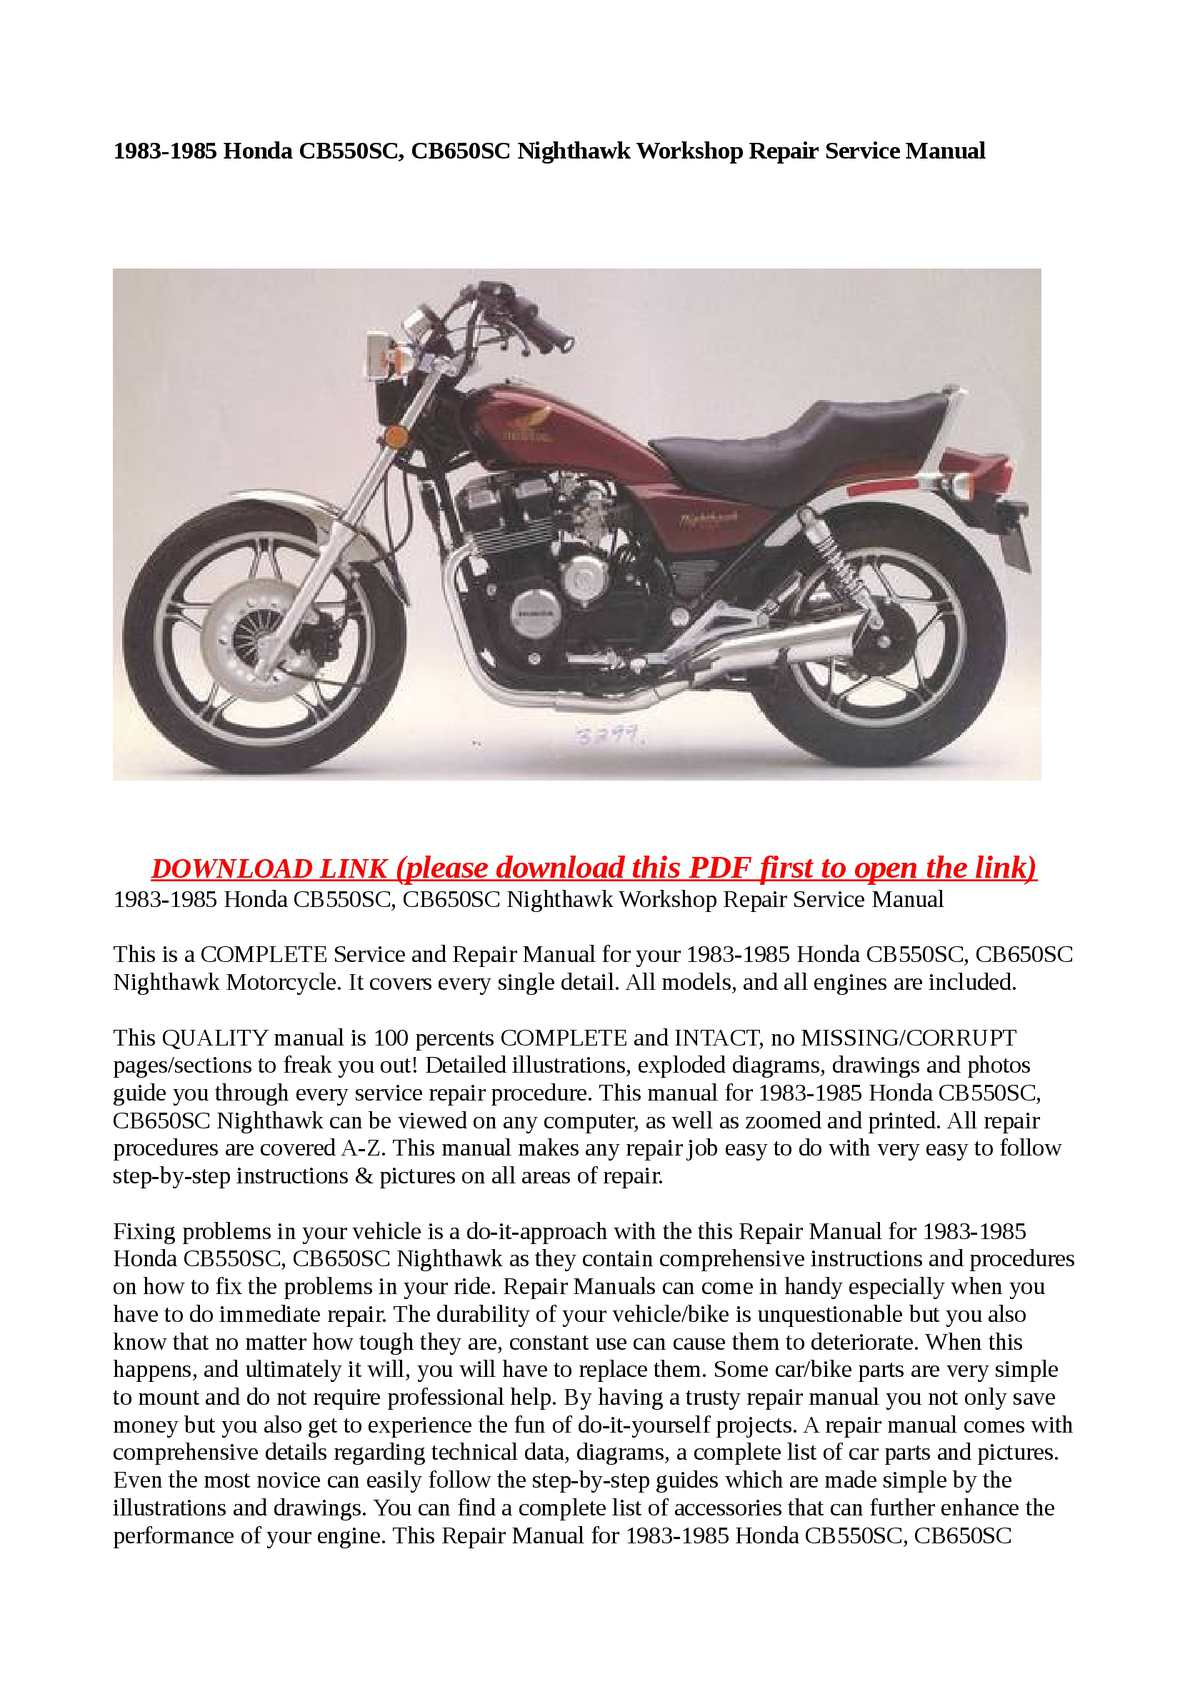 calam o 1983 1985 honda cb550sc cb650sc nighthawk workshop repair rh calameo com 1980 Honda CB650 Cafe Racer 1982 Honda CB750 Custom